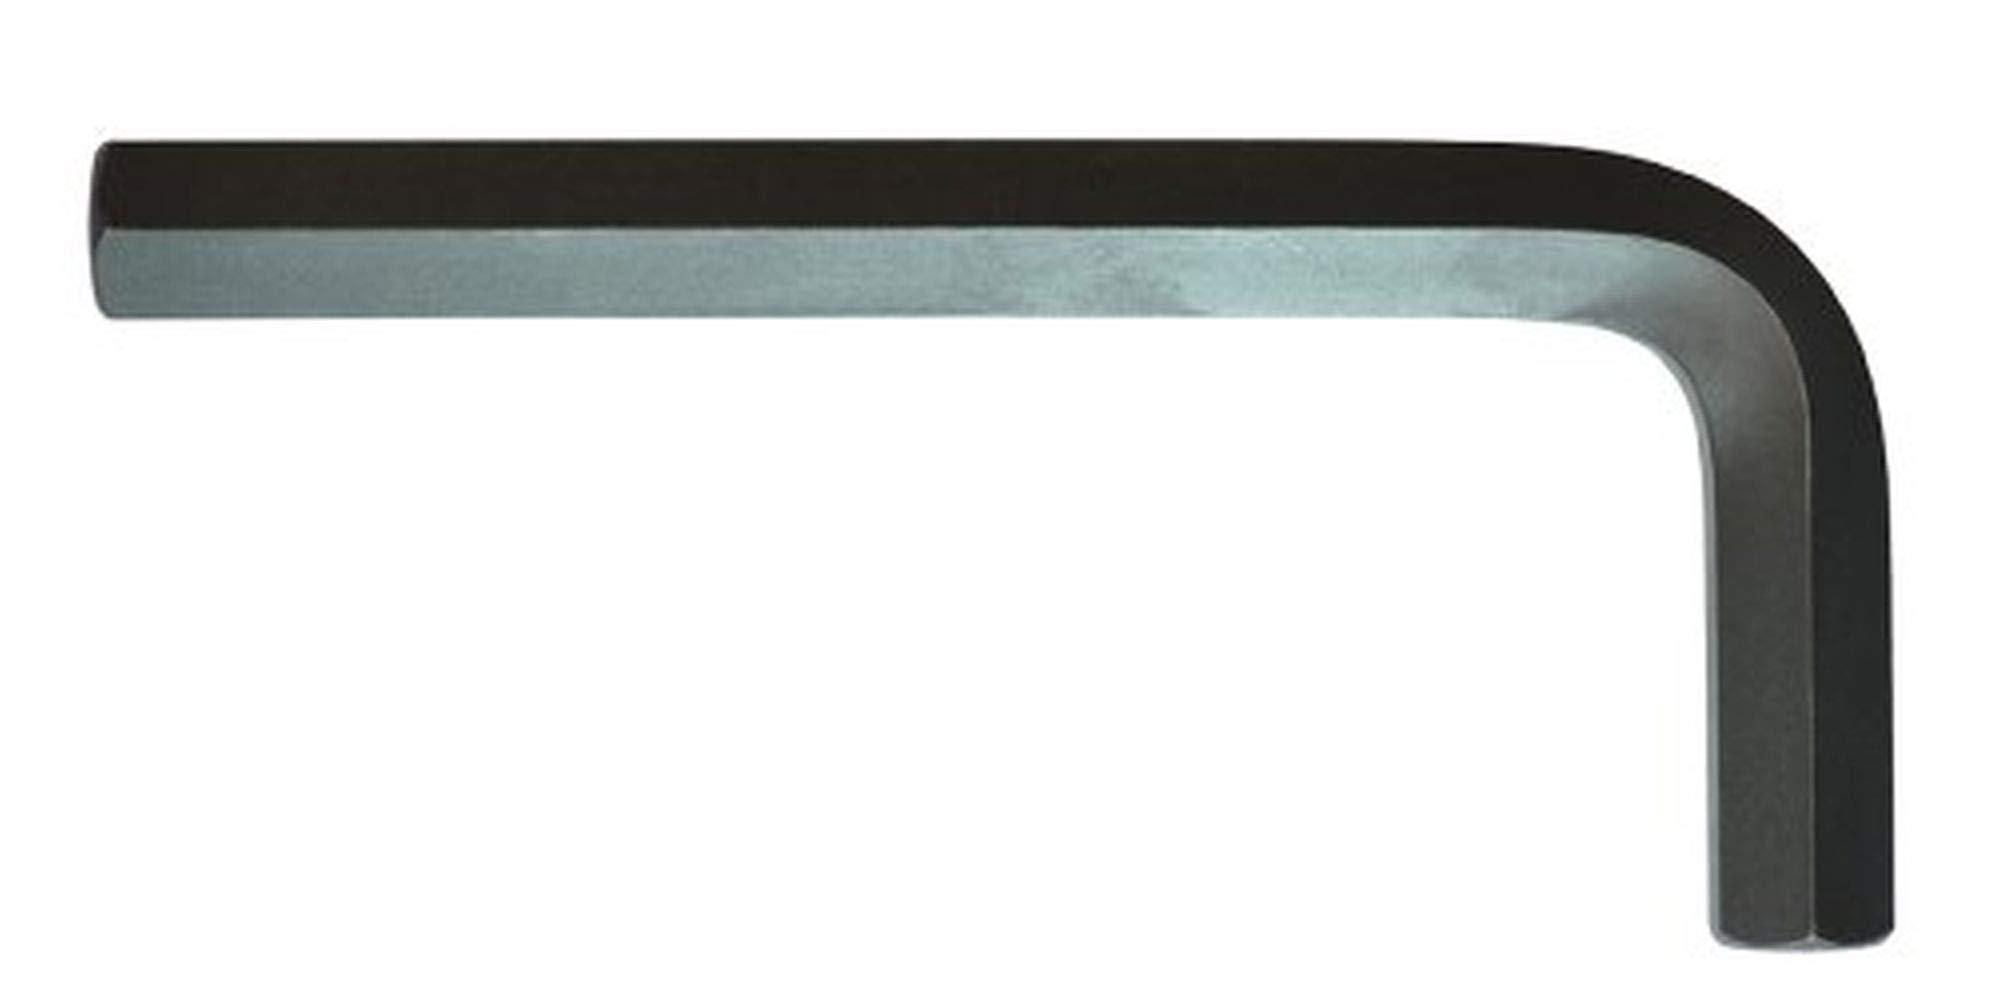 Bondhus 12295 27mm Short Hex L-Wrench